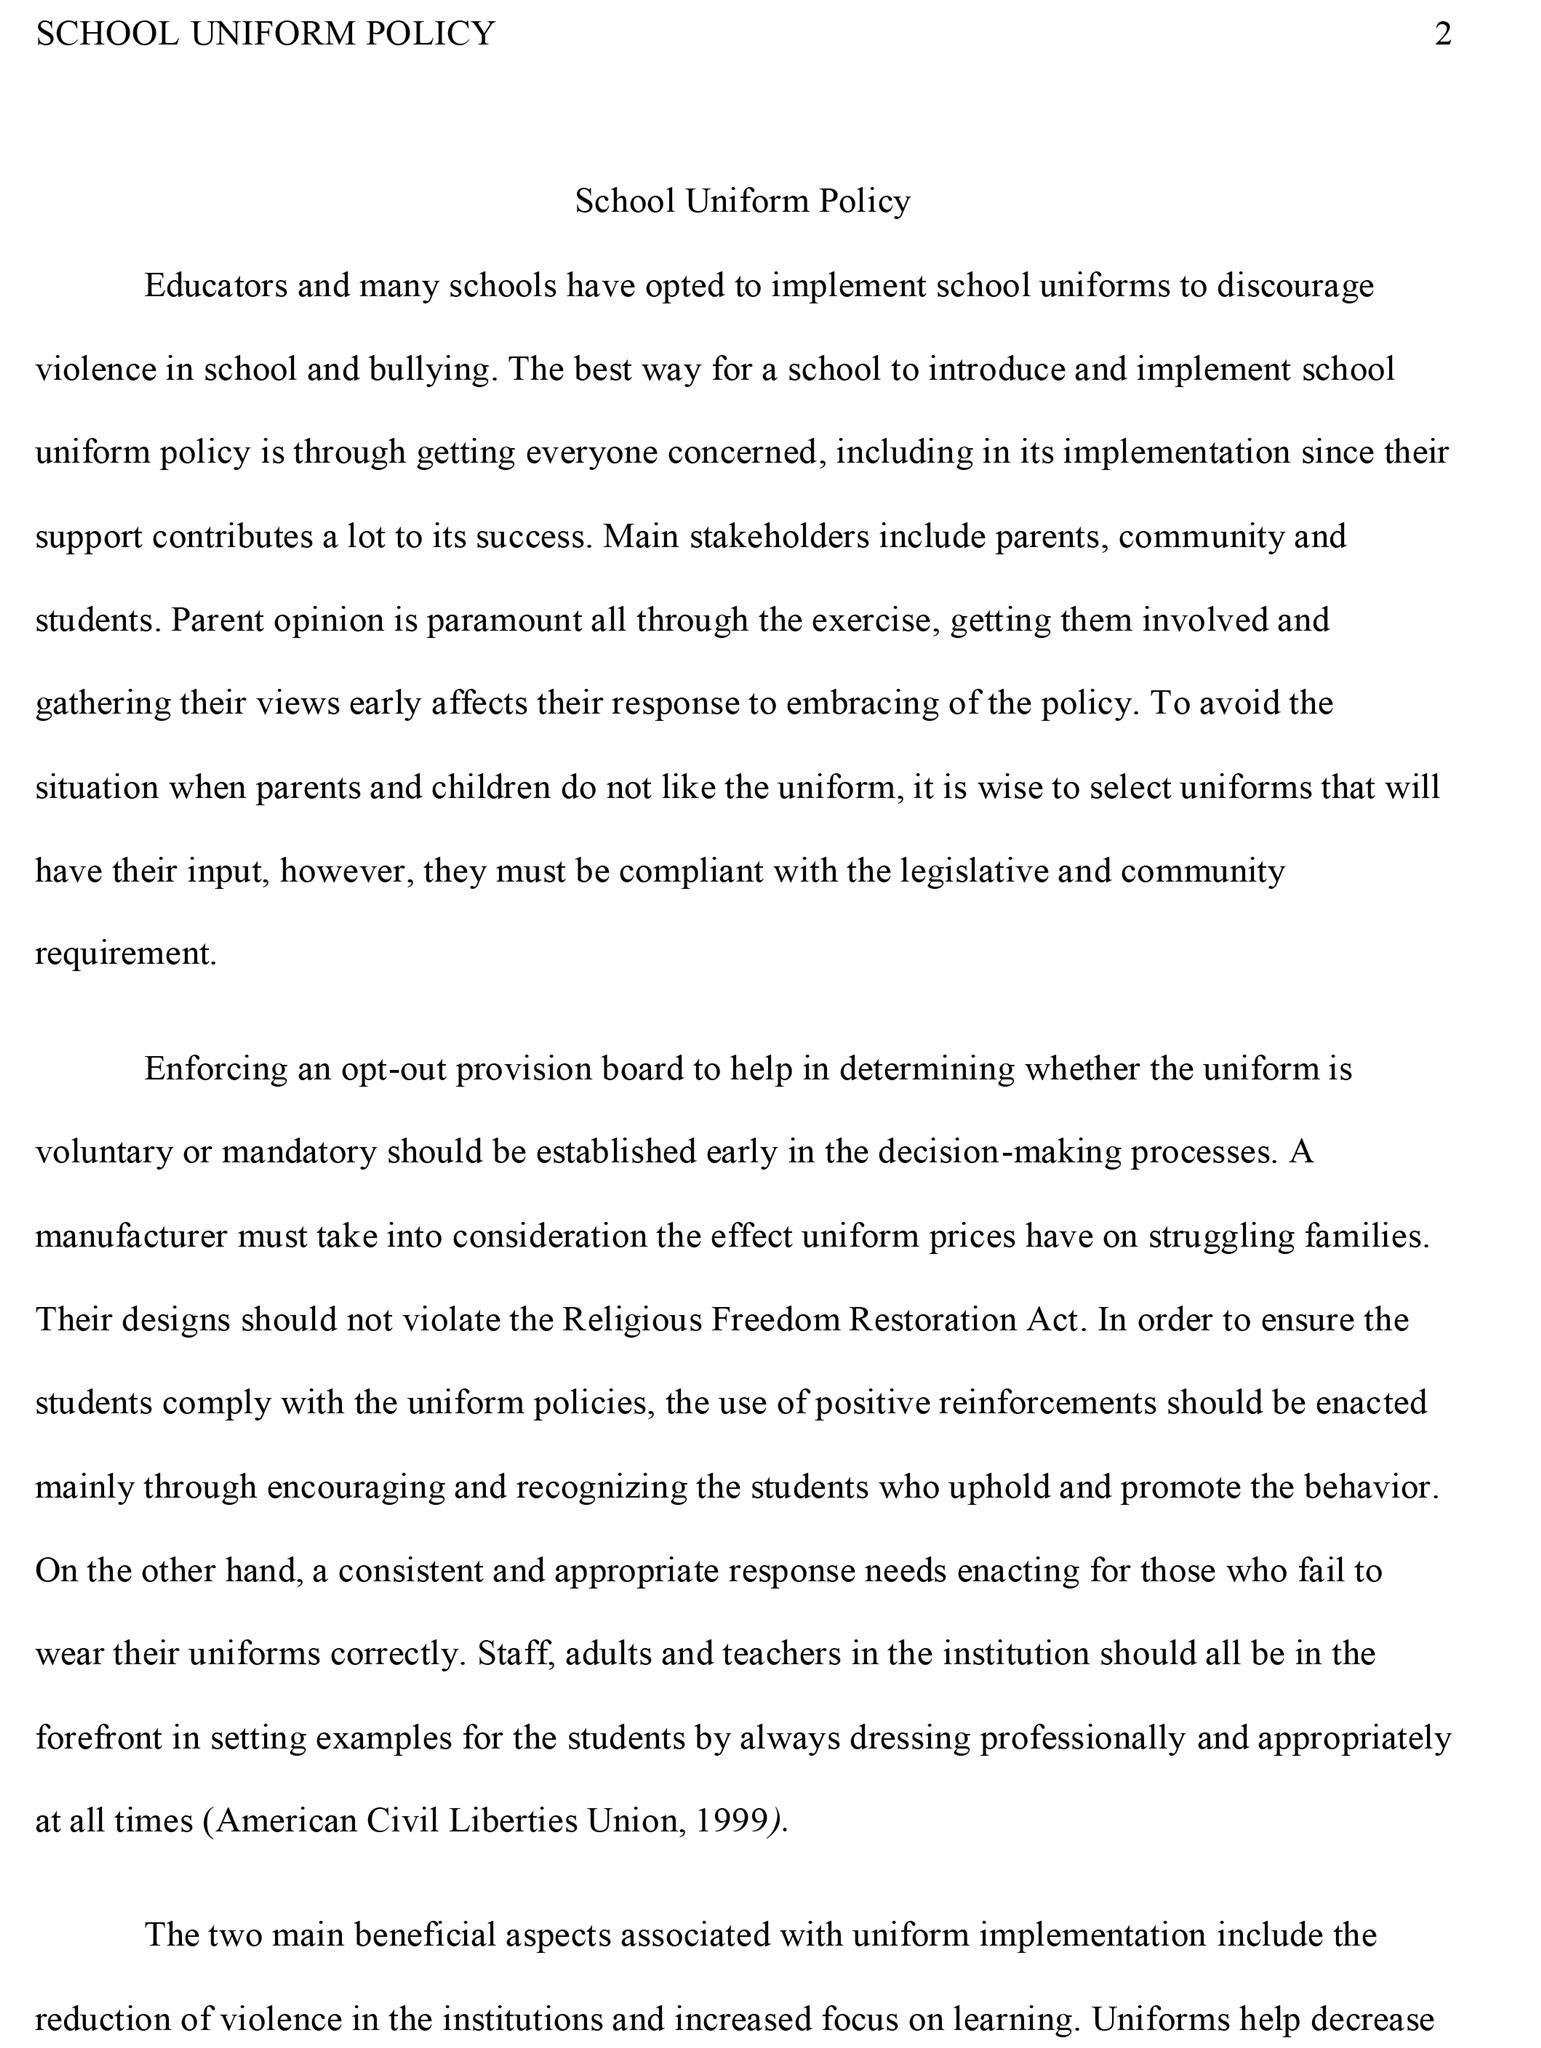 001 School Sample Uniform Essay Sensational Is Compulsory In Hindi Conclusion Full